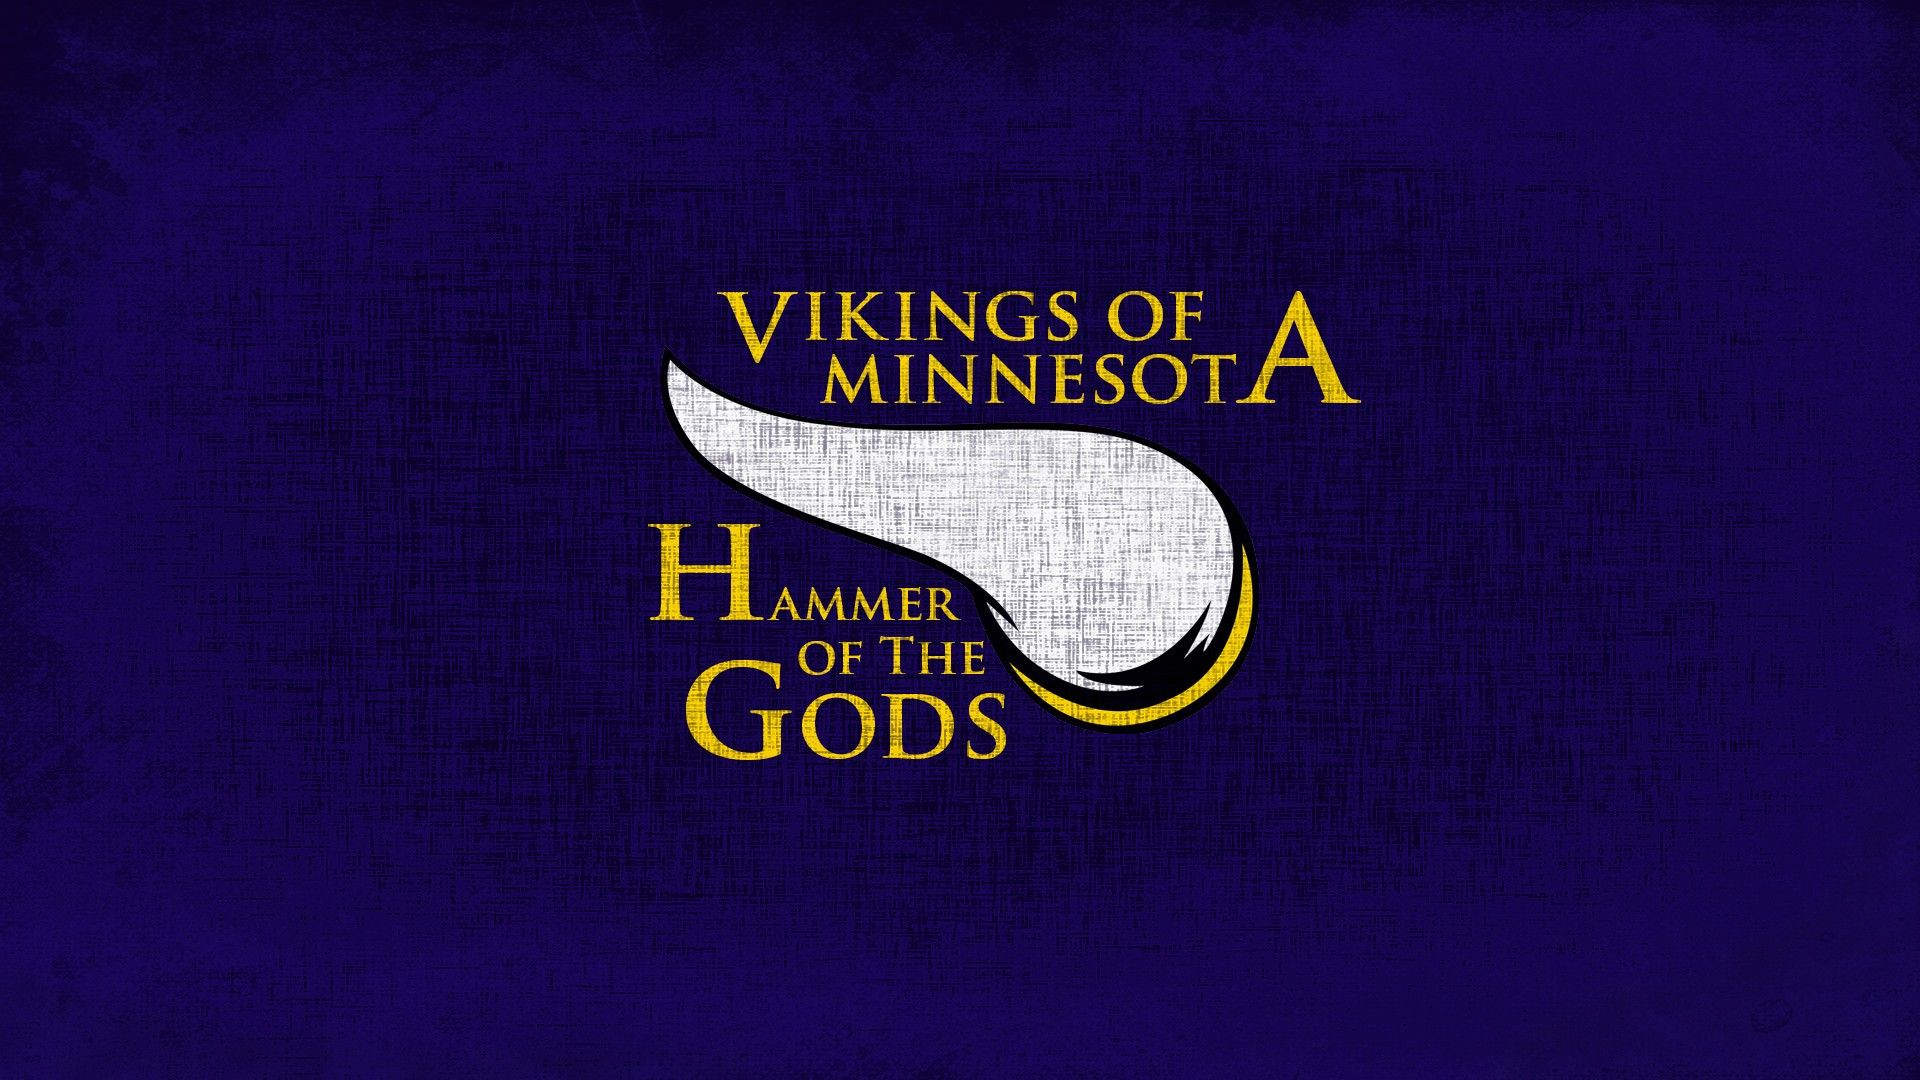 Hd Desktop Wallpaper Minnesota Vikings Minnesota Vikings Logo Viking Wallpaper Minnesota Vikings Wallpaper